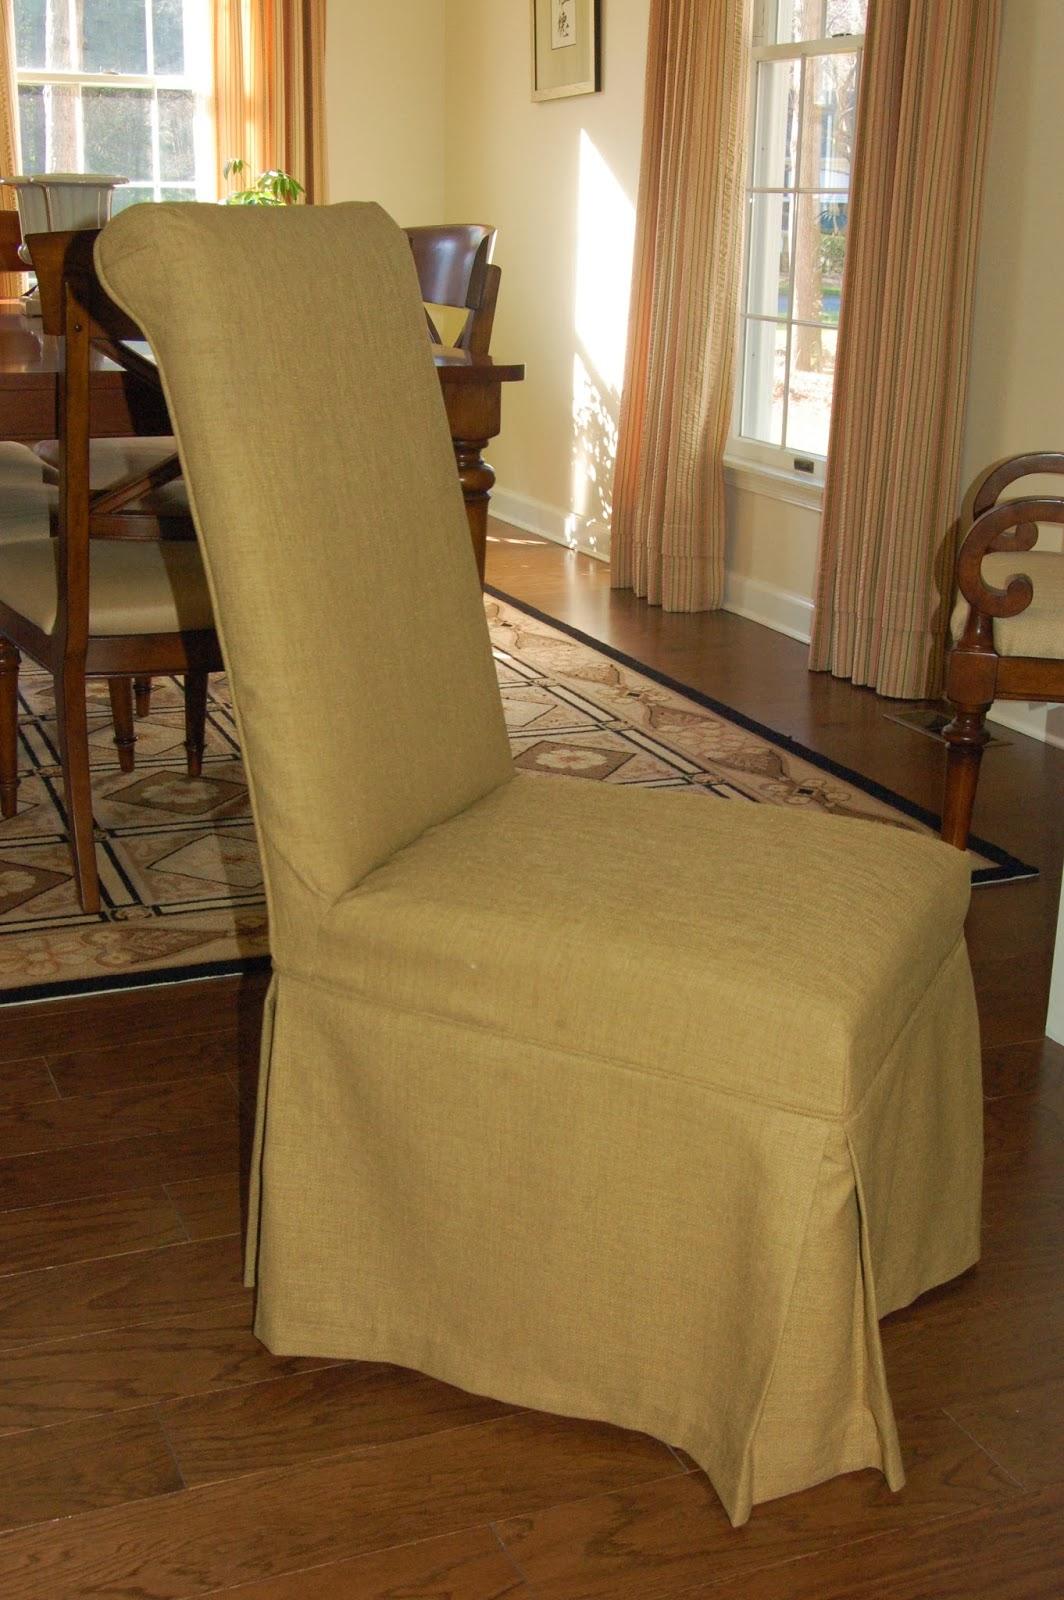 Burlap Dining Chair Covers Yellow Fabric Desk Pam Morris Sews Slipcovers